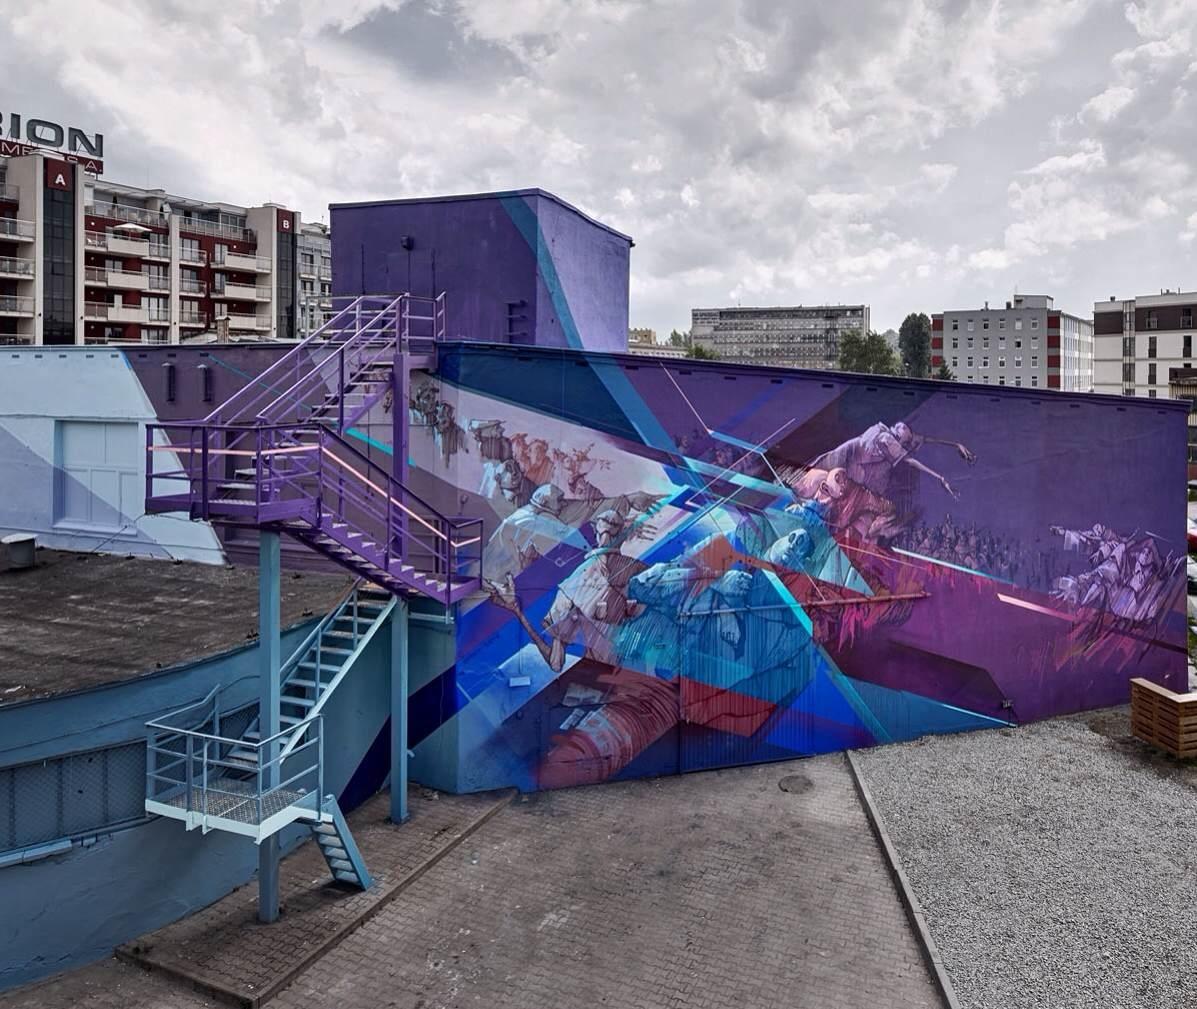 Nawer & Sepe in Krakow. Via Graffuturism.